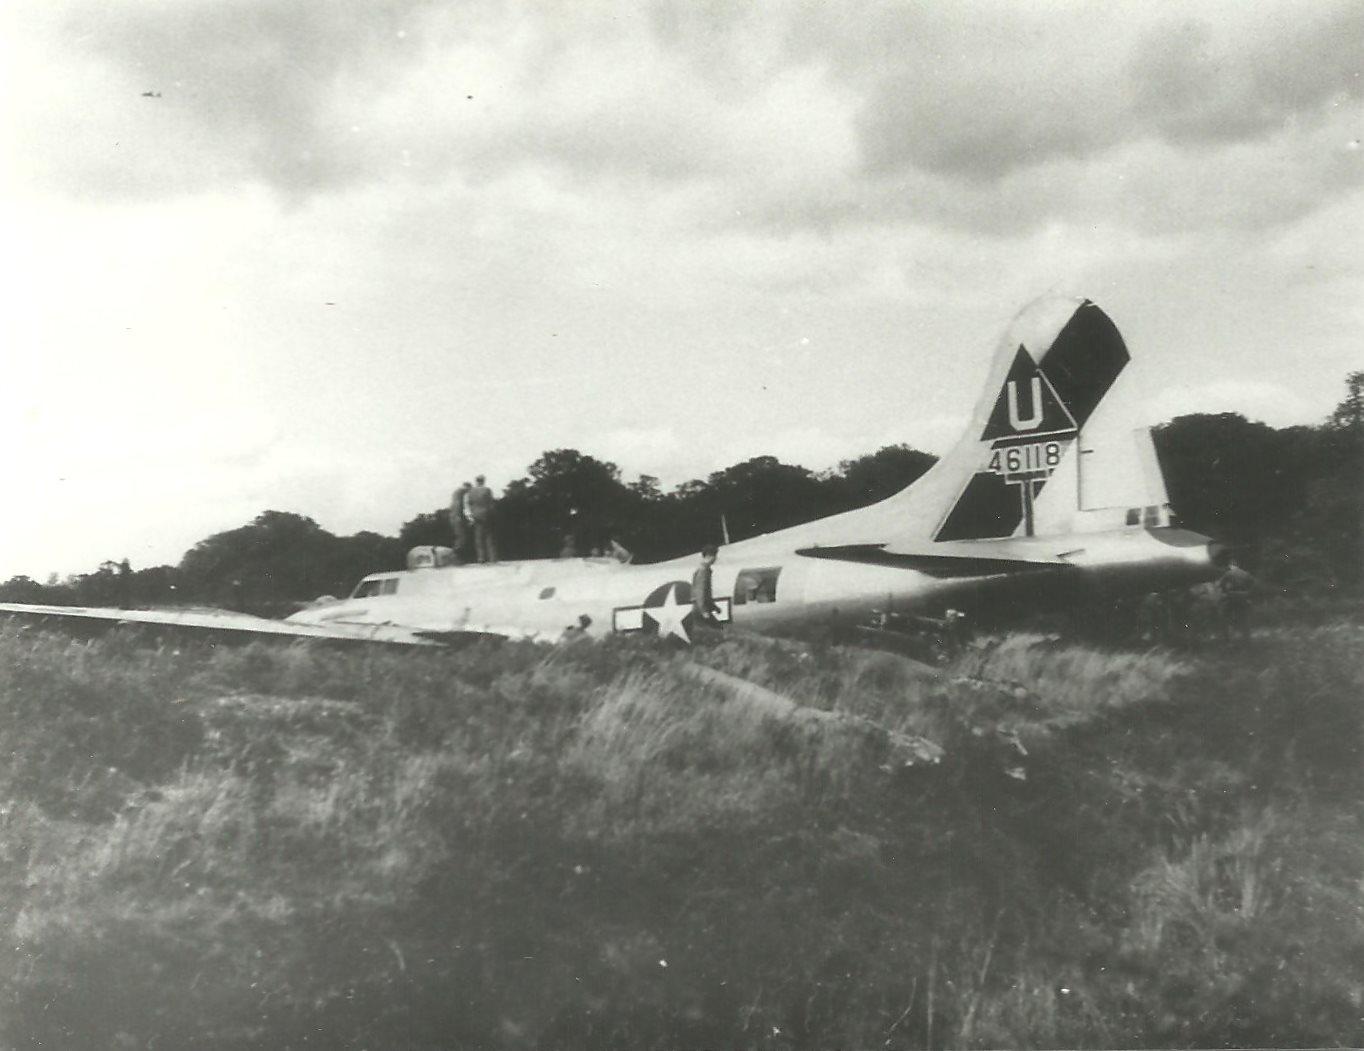 B-17 #44-6118